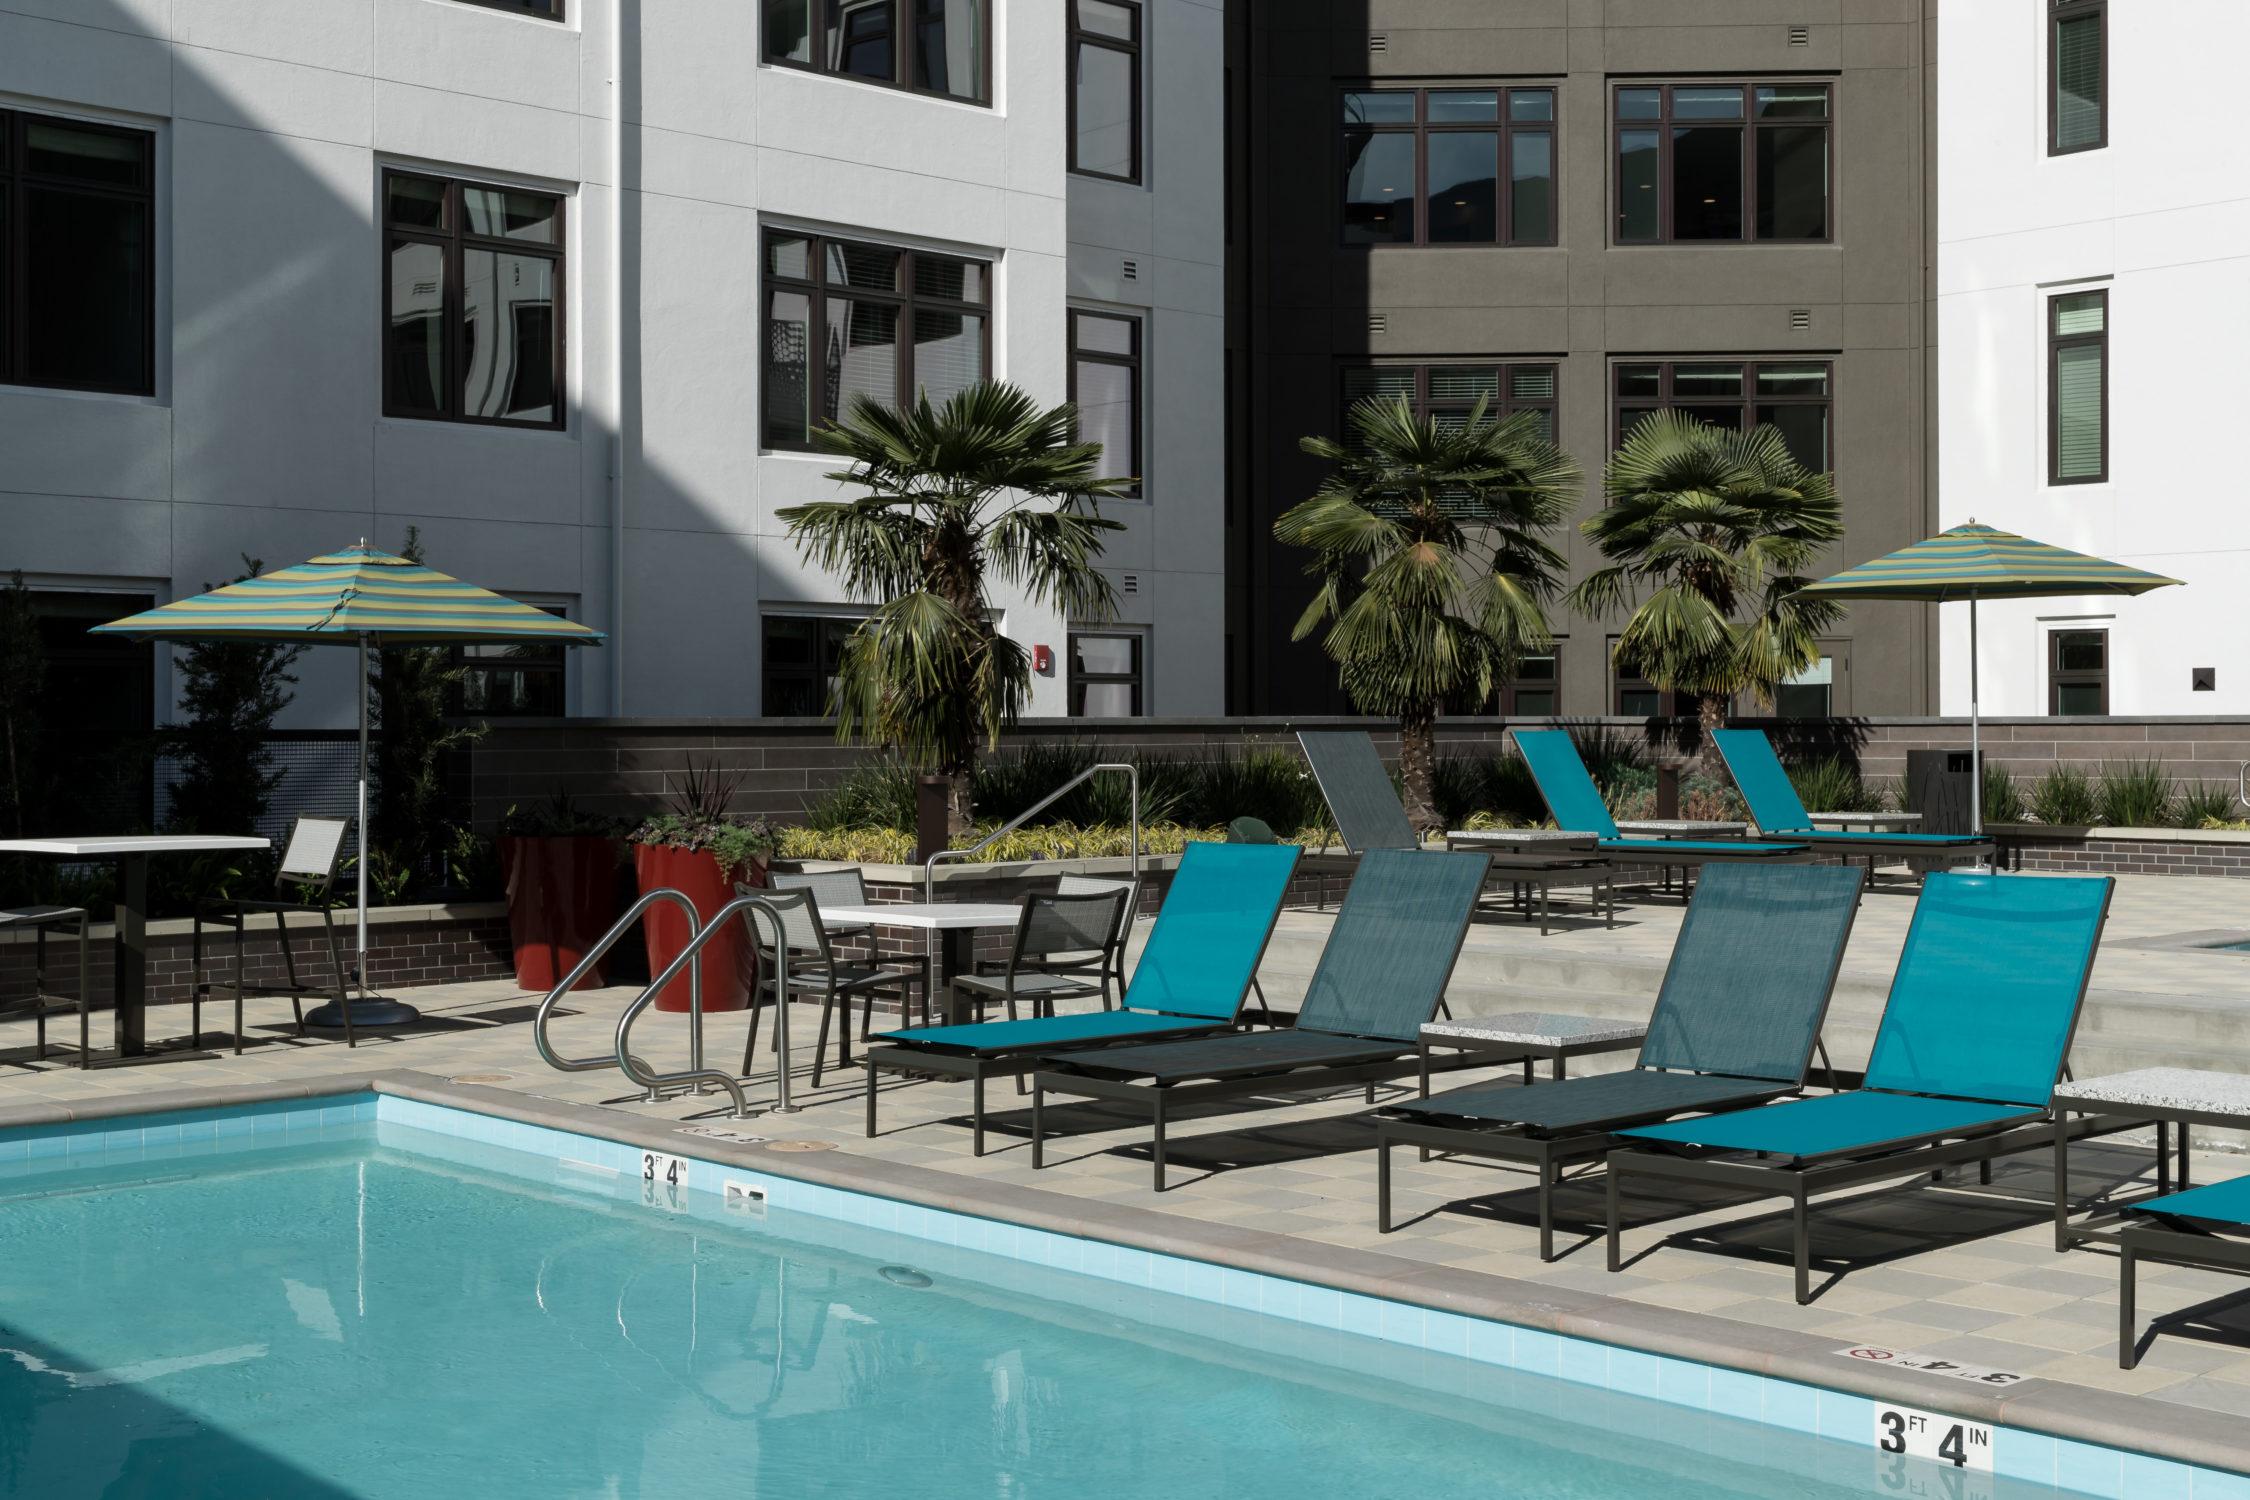 AME Pool Deck TCRA 4193 167